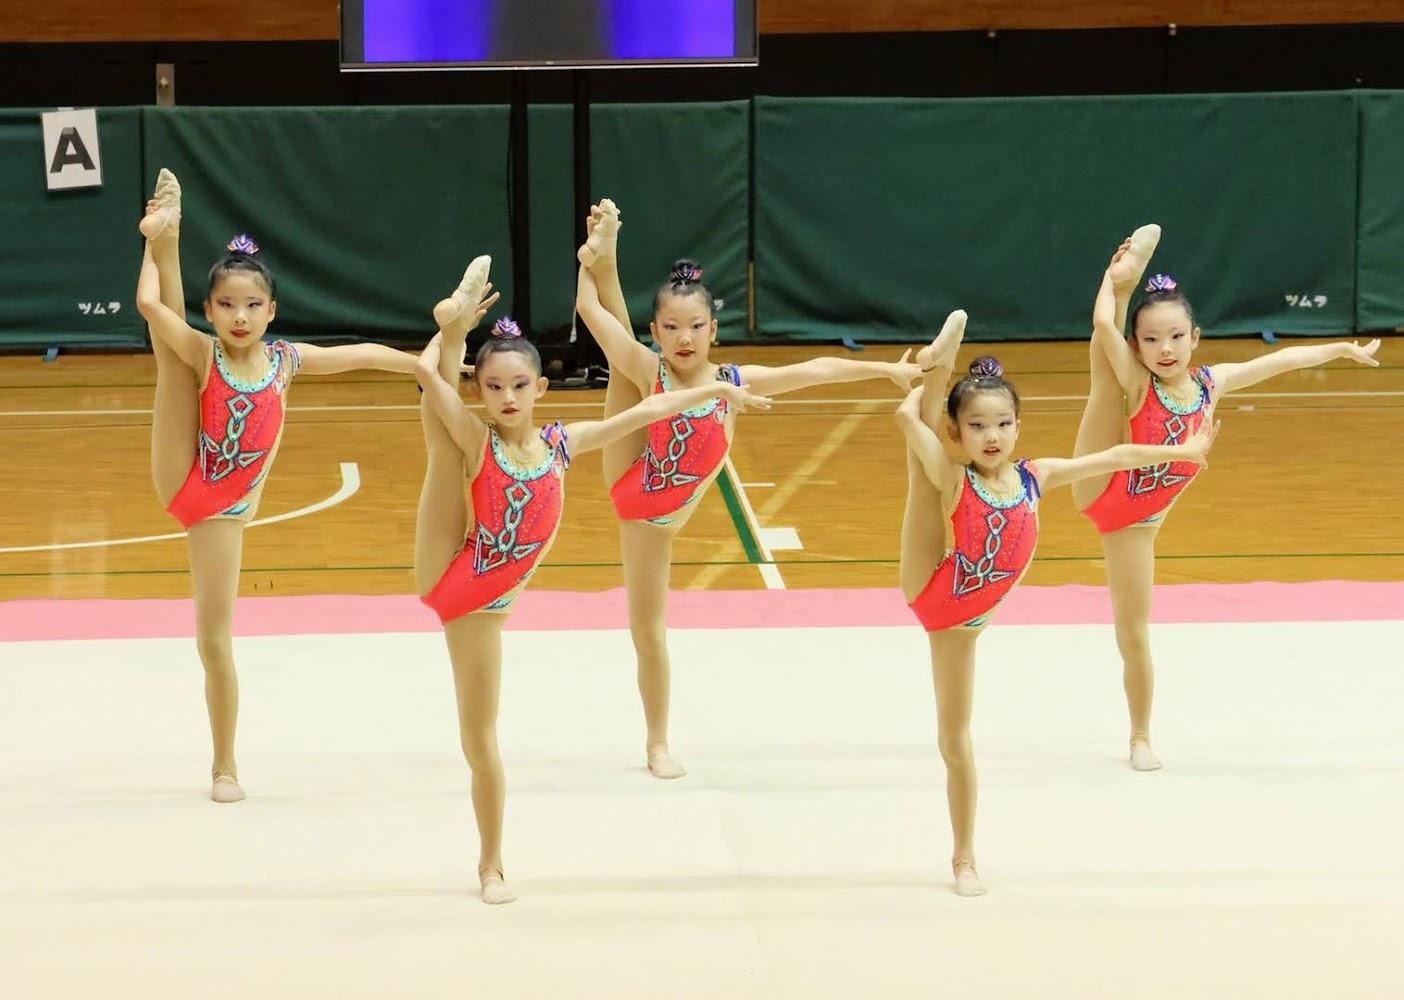 四国ジュニア新体操選手権大会(団体徒手)